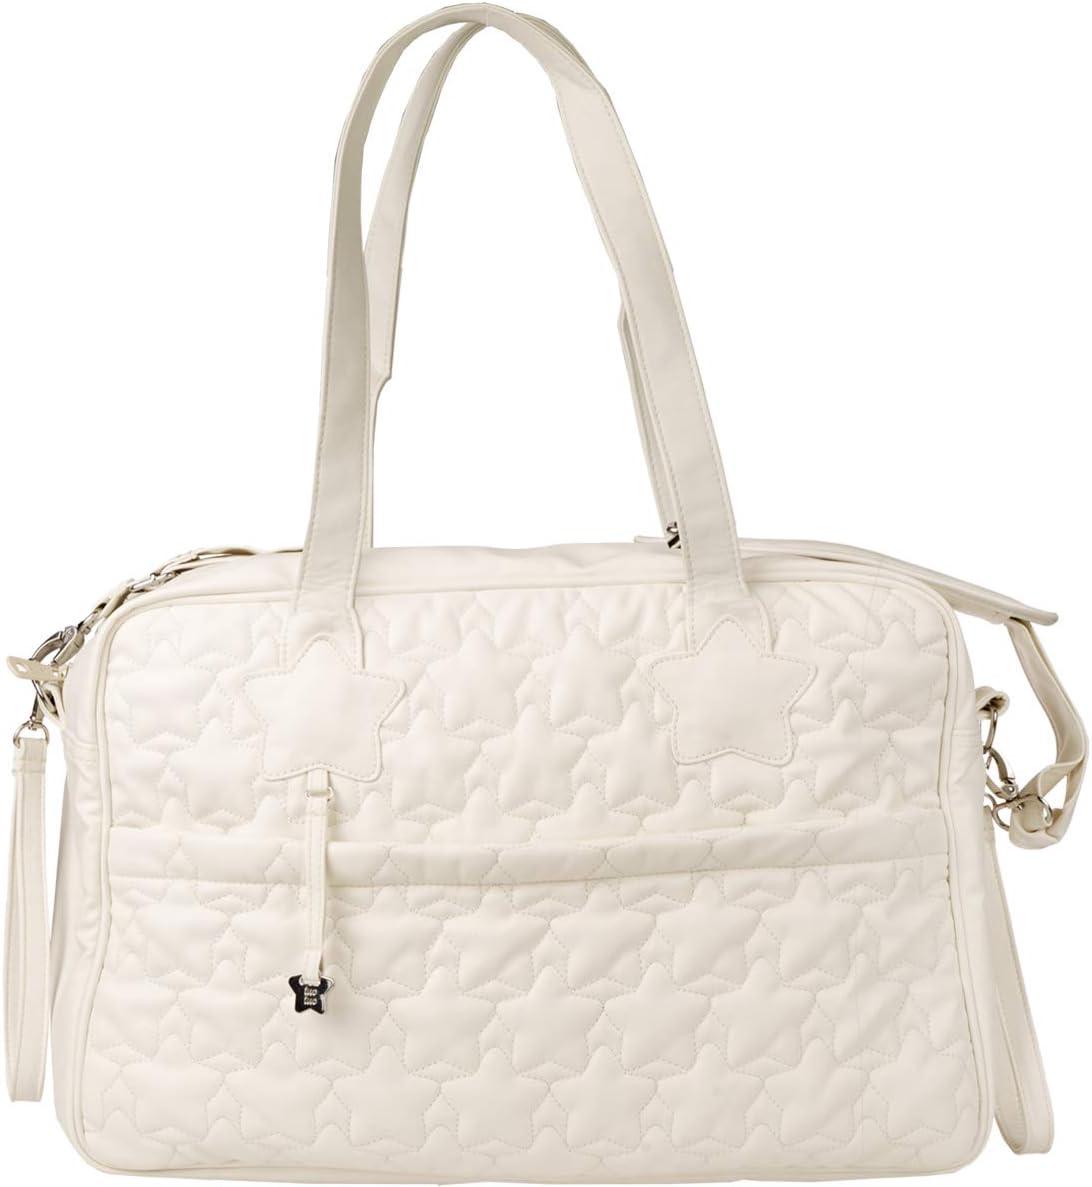 Tuc Tuc Coulant - Bolsa maternidad de polipiel, color blanco